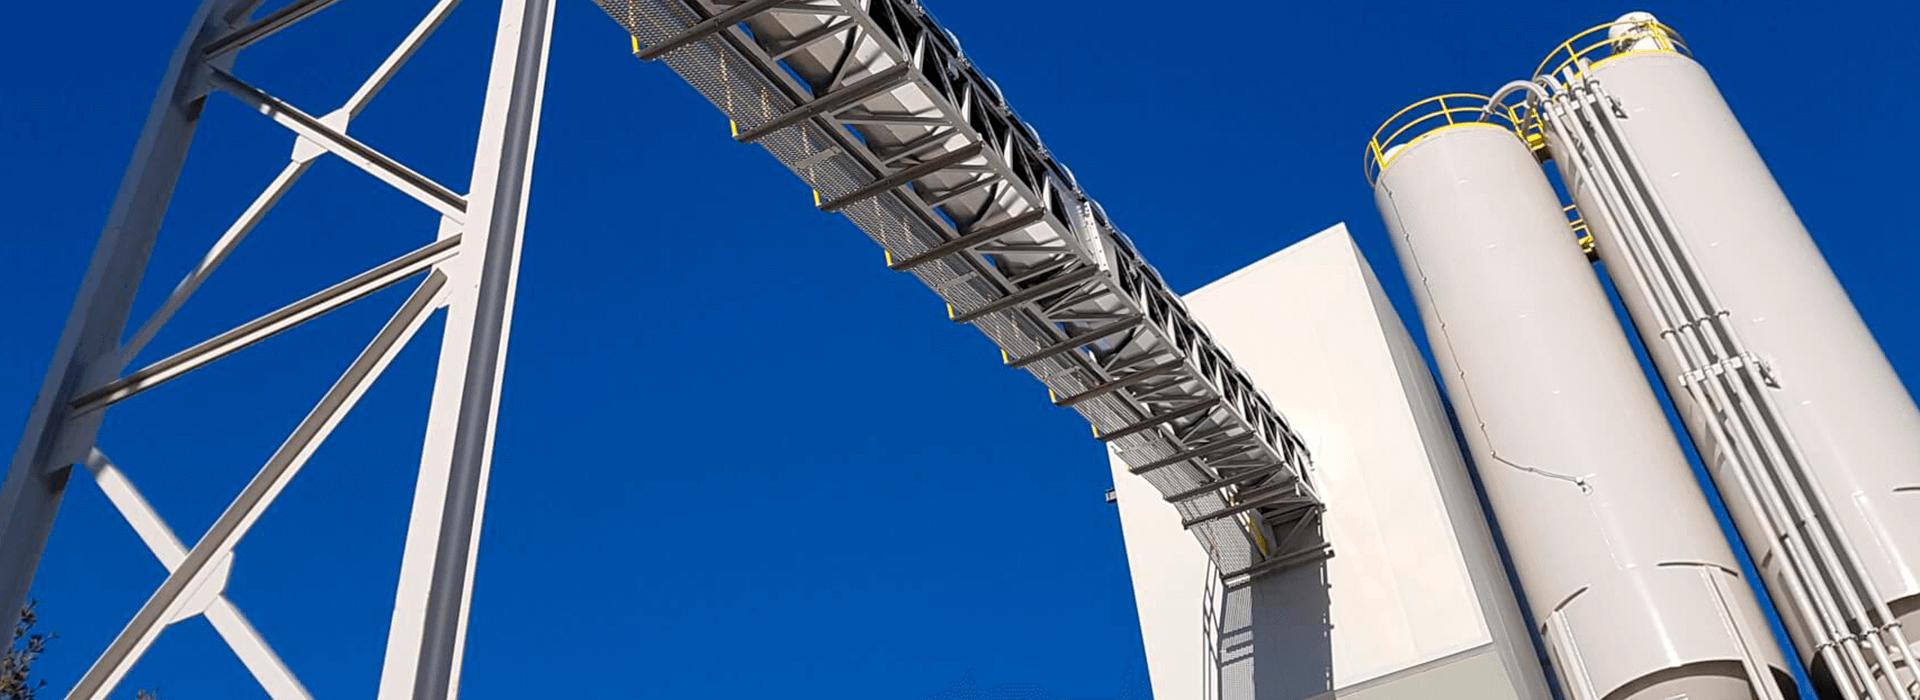 Astec BMH custom concrete plant for the precast industry